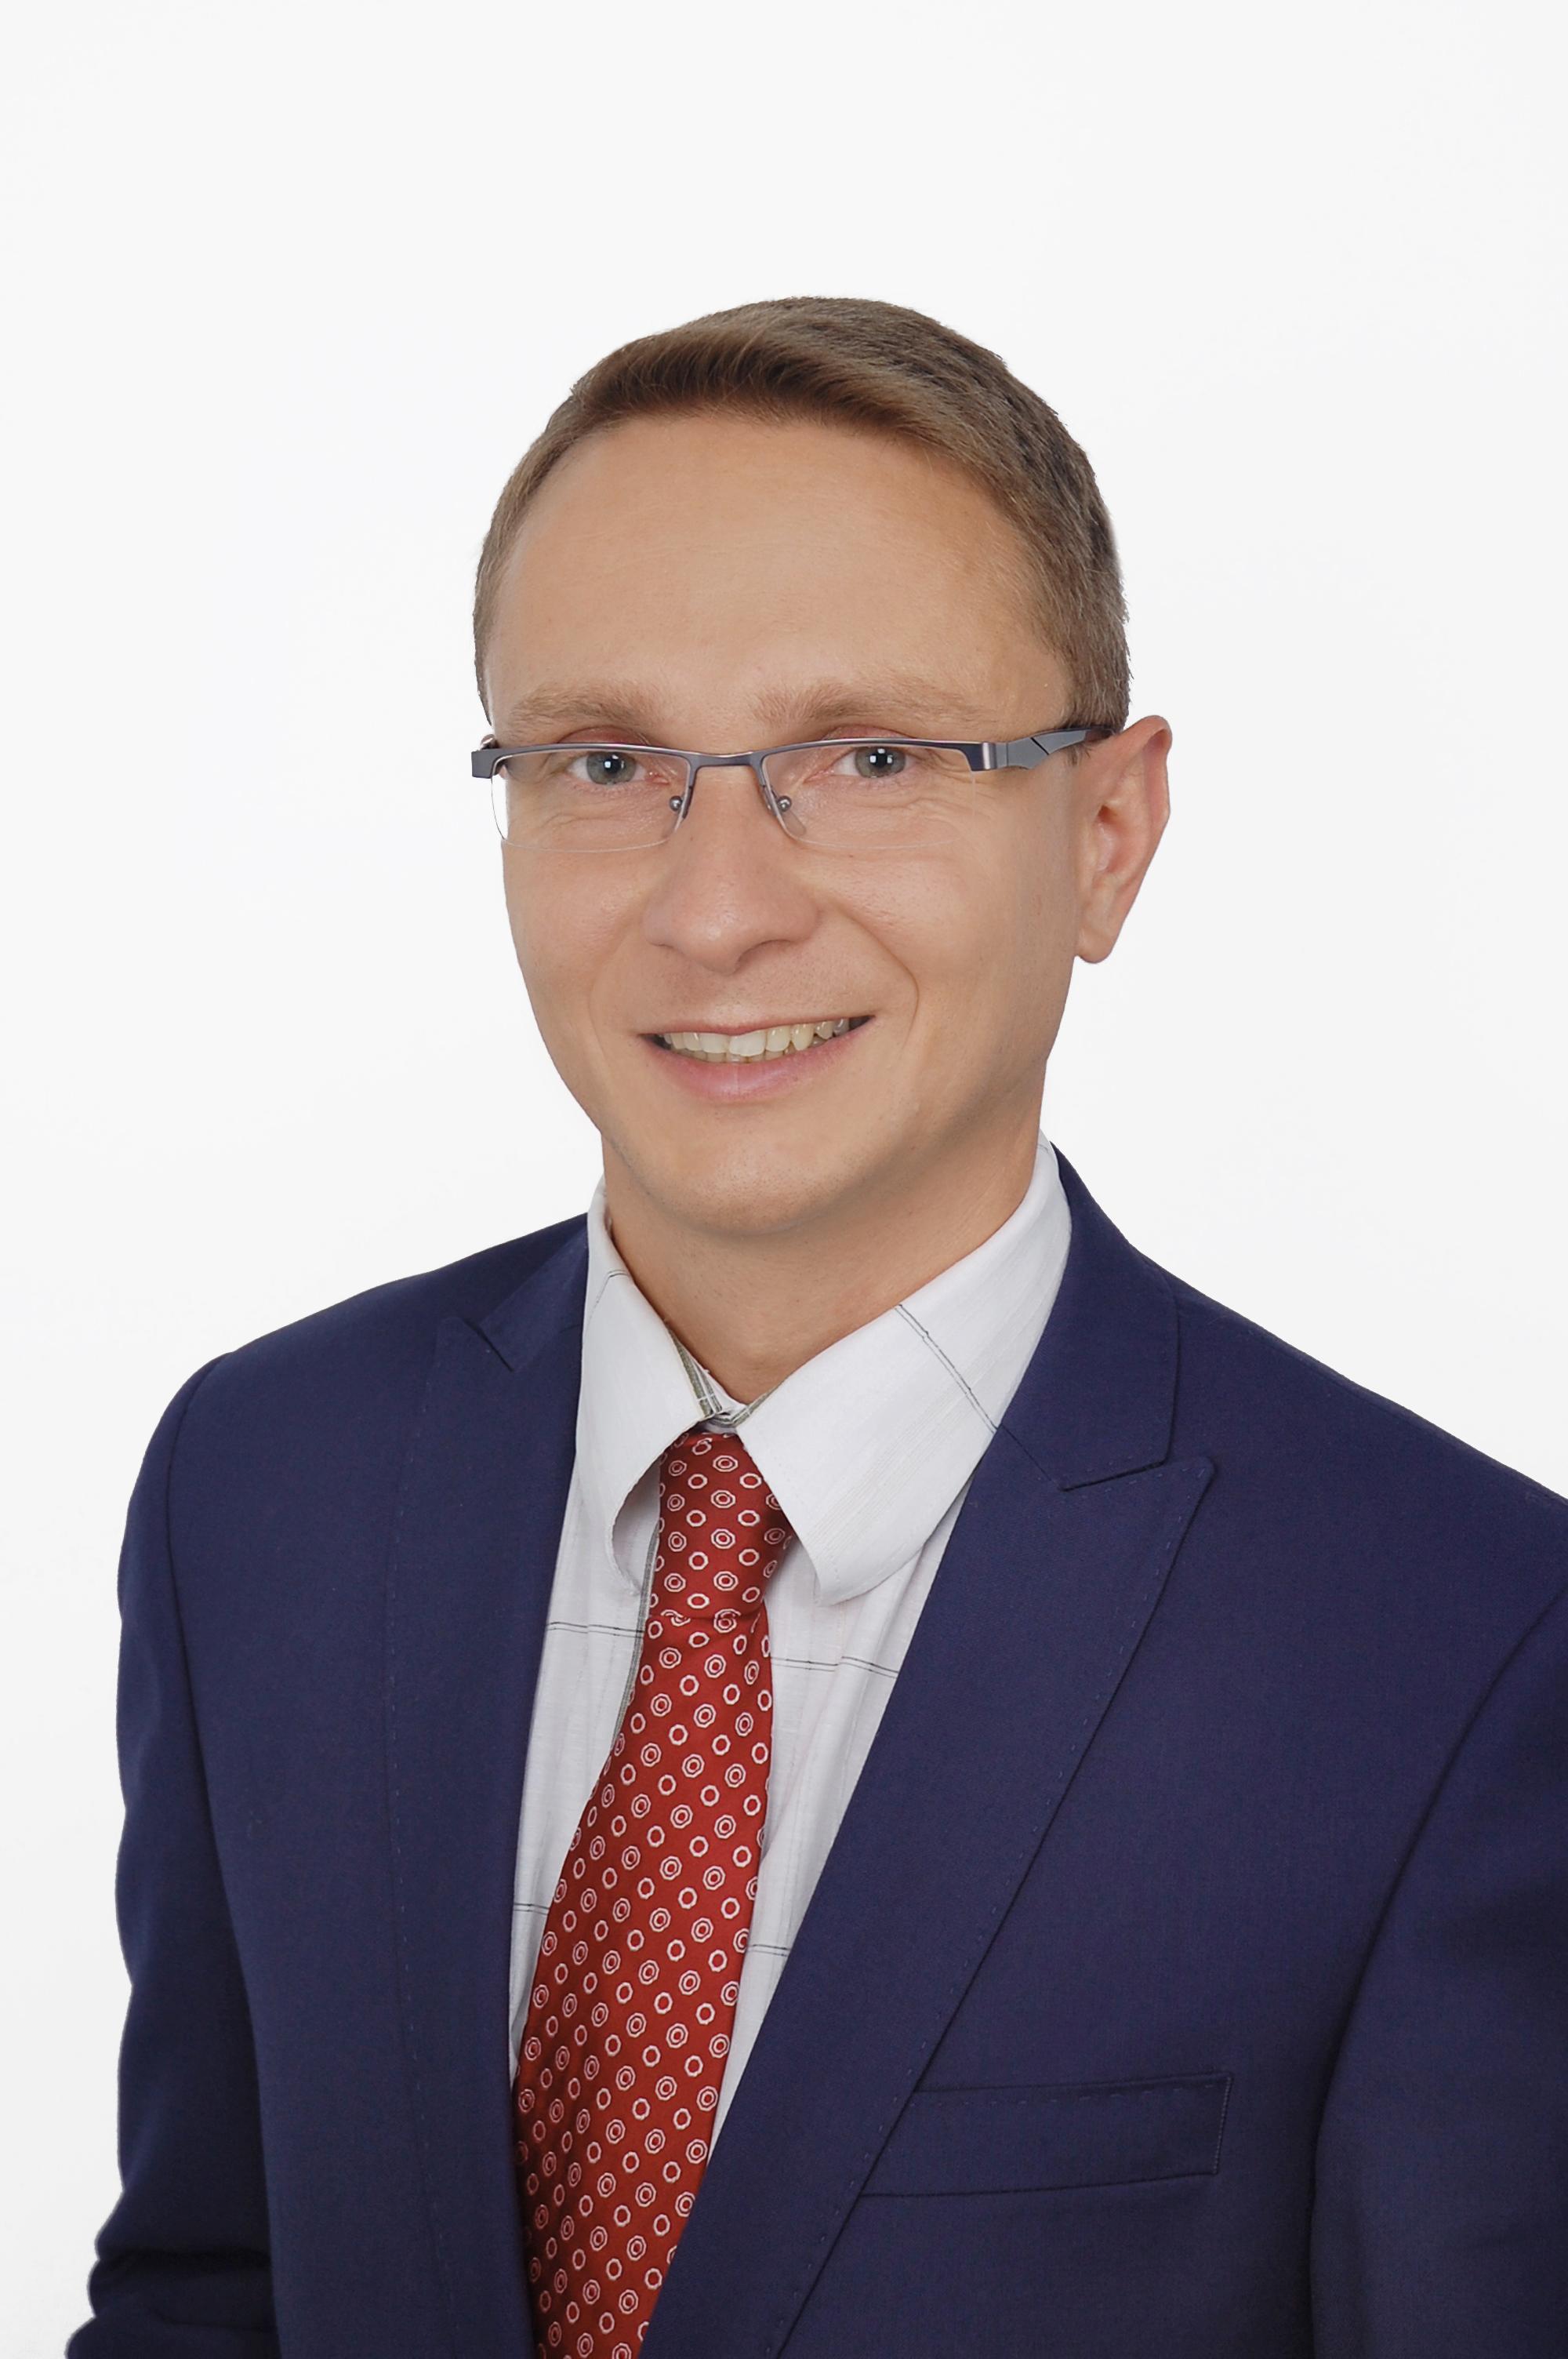 Uruski-Piotr